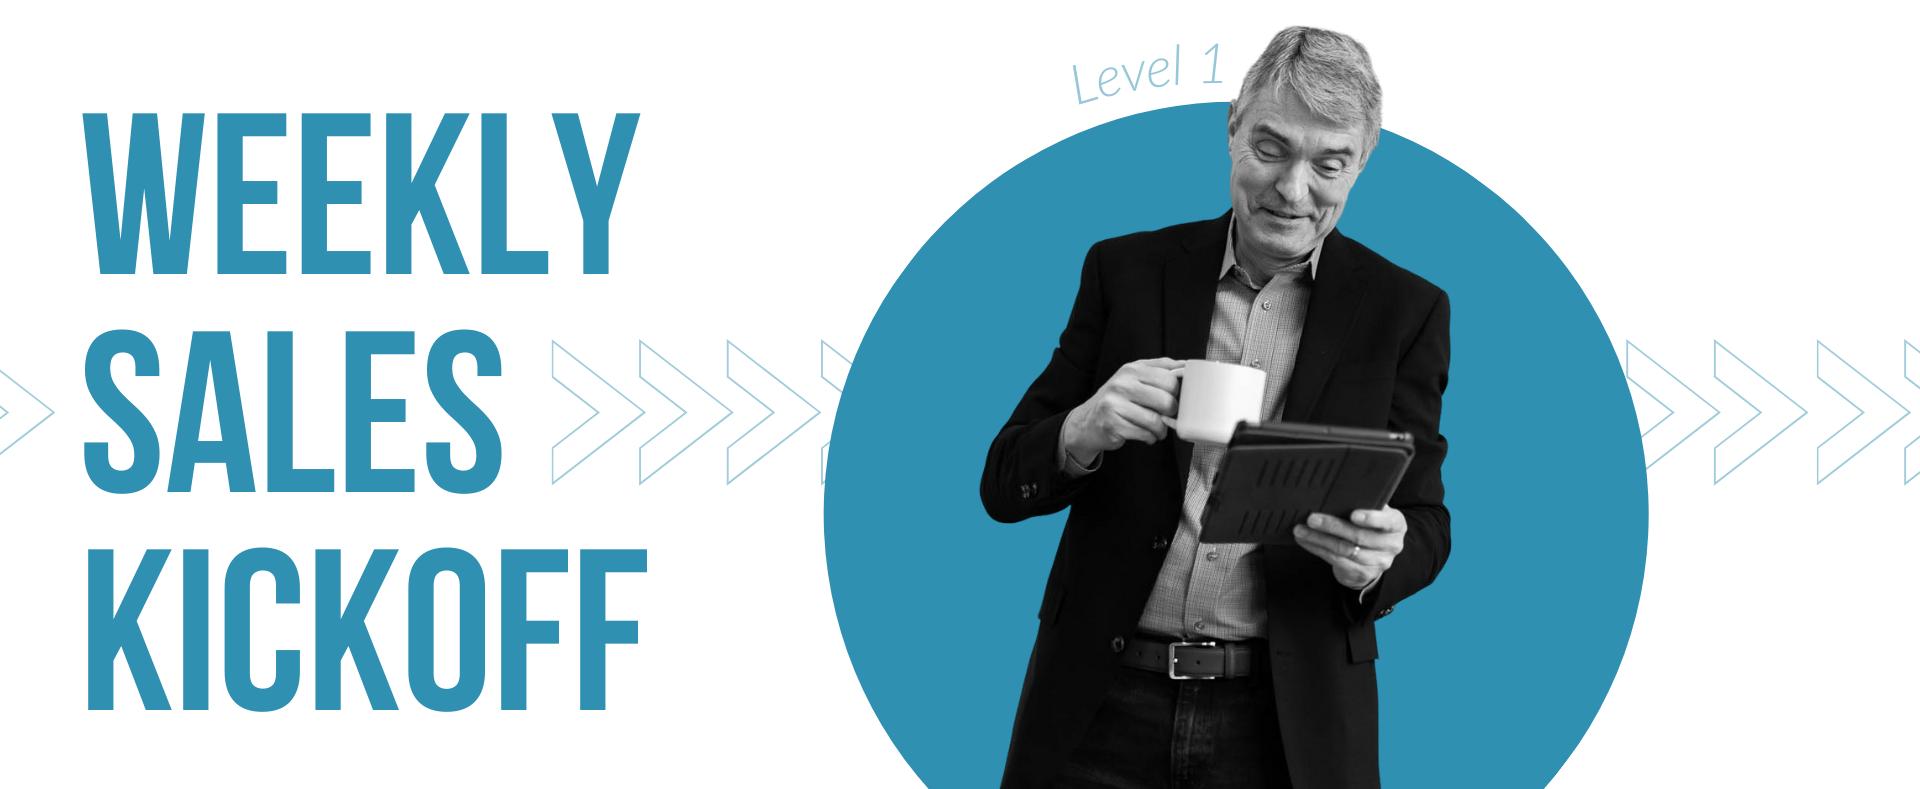 Level 1 - Weekly Sales Kickoff